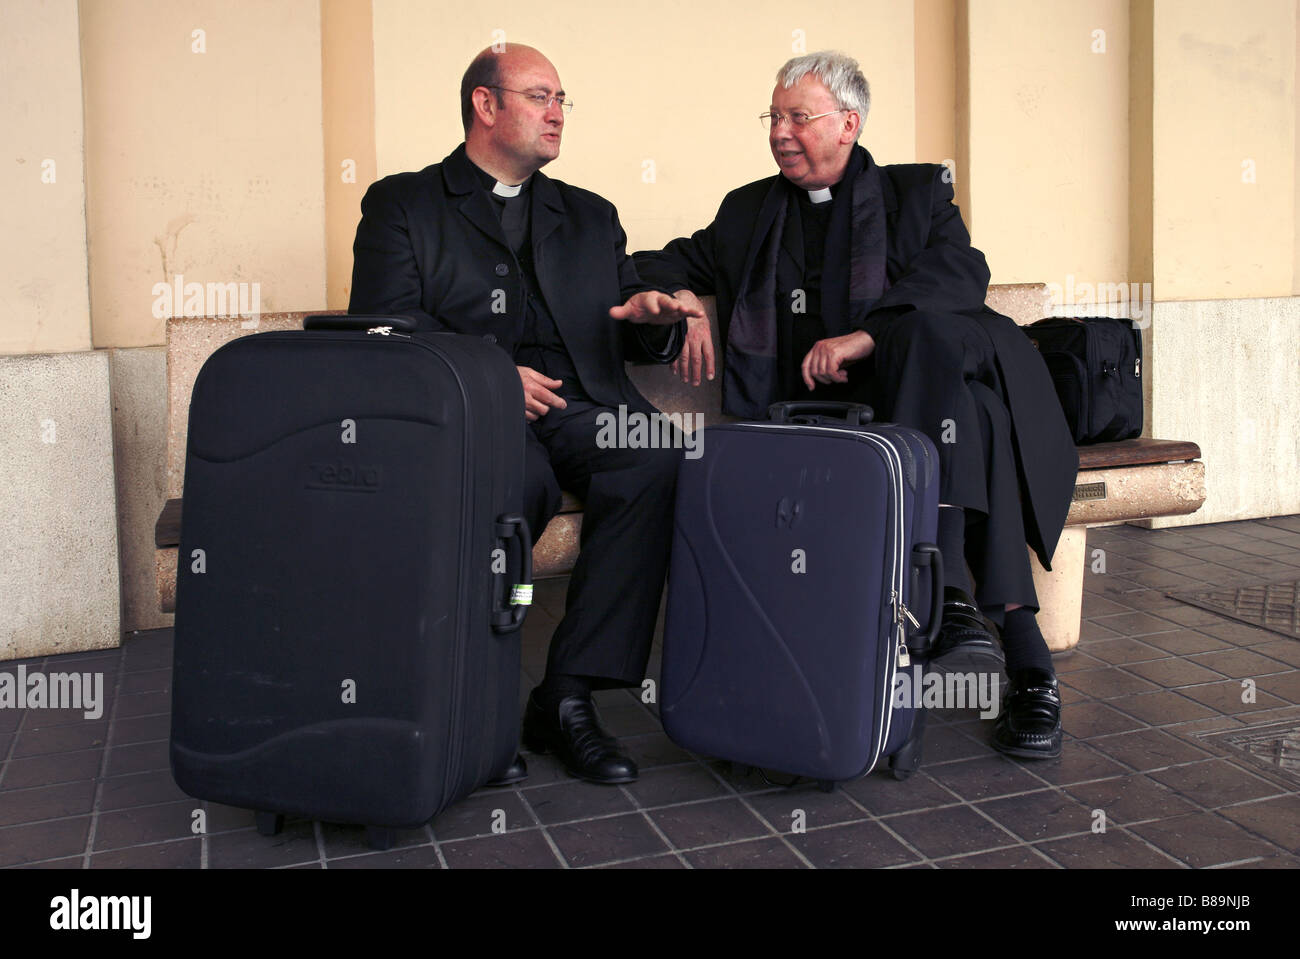 Catholic Priests, Assisi Train Station, Assisi, Umbria, Italy - Stock Image